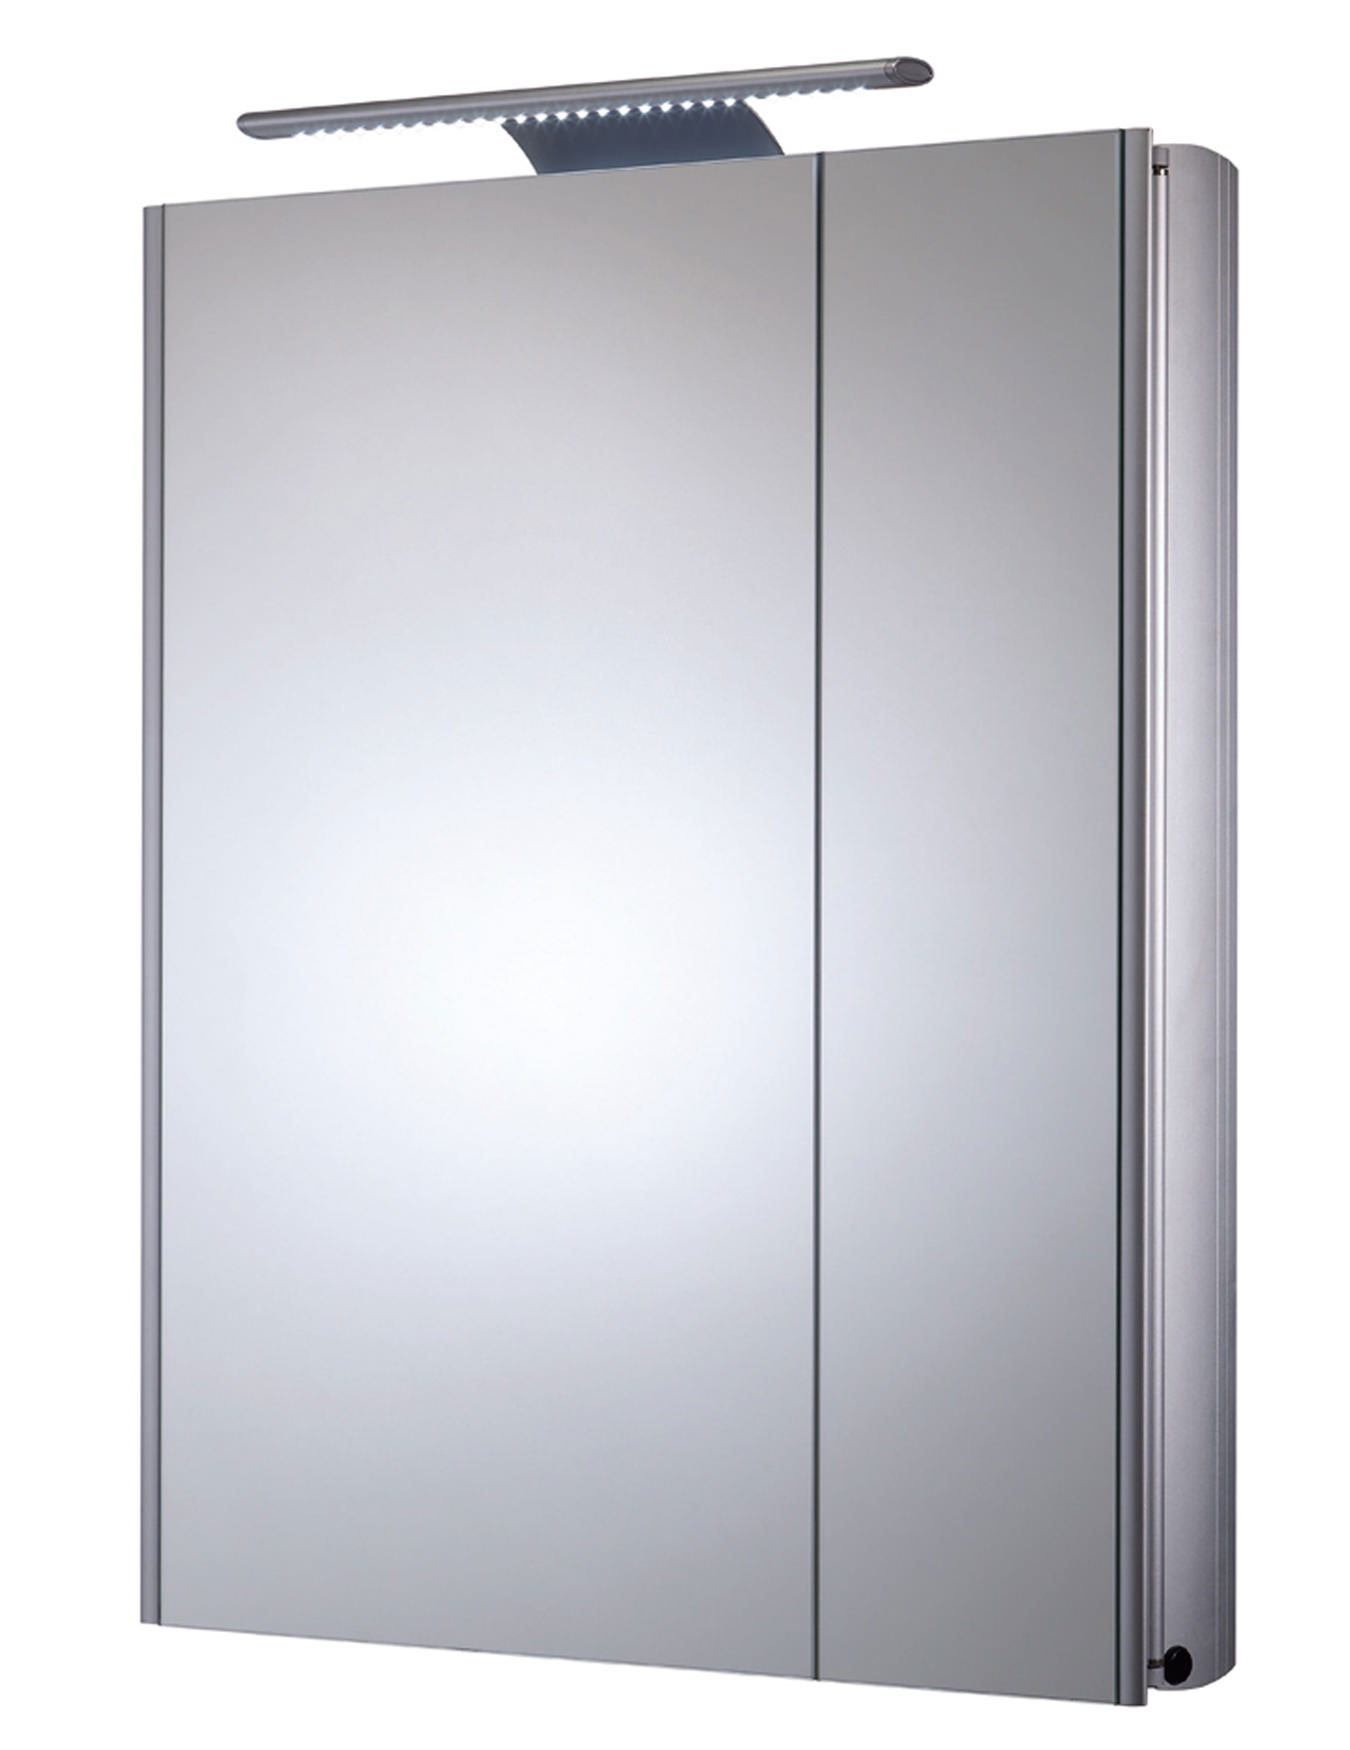 Roper rhodes ascension refine slimline bathroom cabinet for Slimline bathroom cupboard